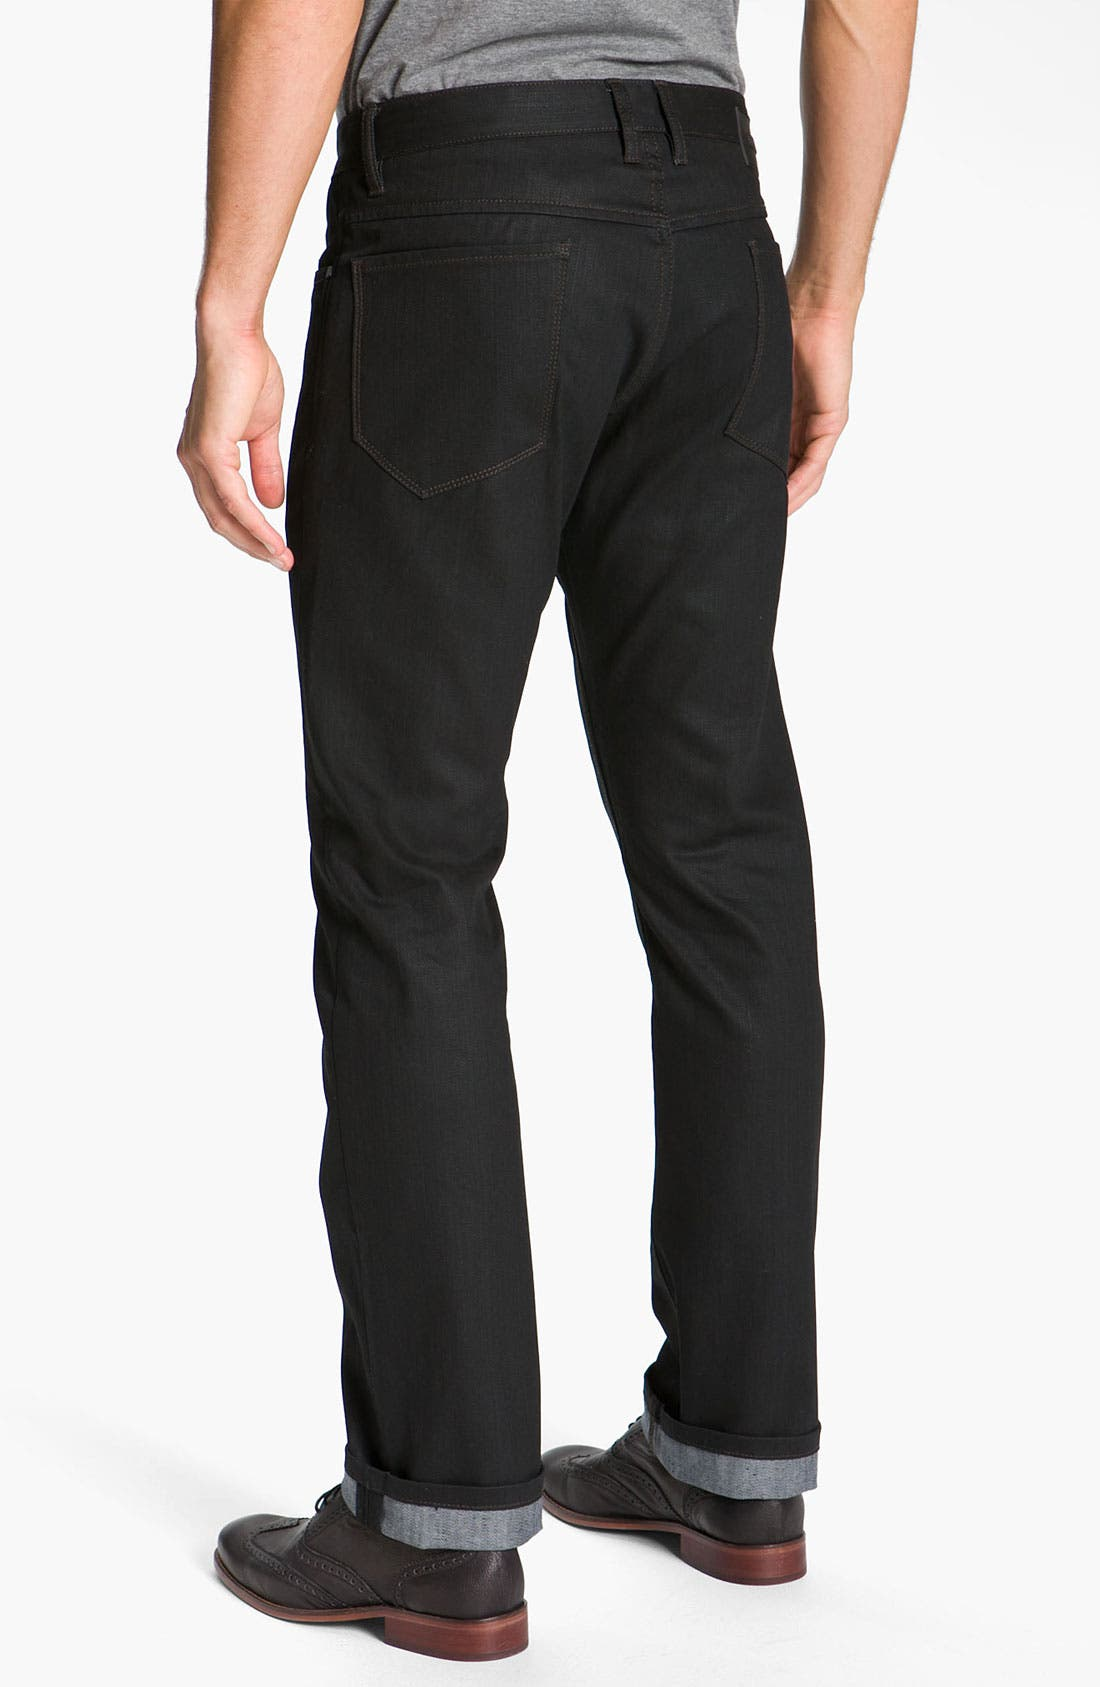 Alternate Image 1 Selected - Comune 'Rudy' Coated Slim Straight Leg Jeans (Black Indigo)